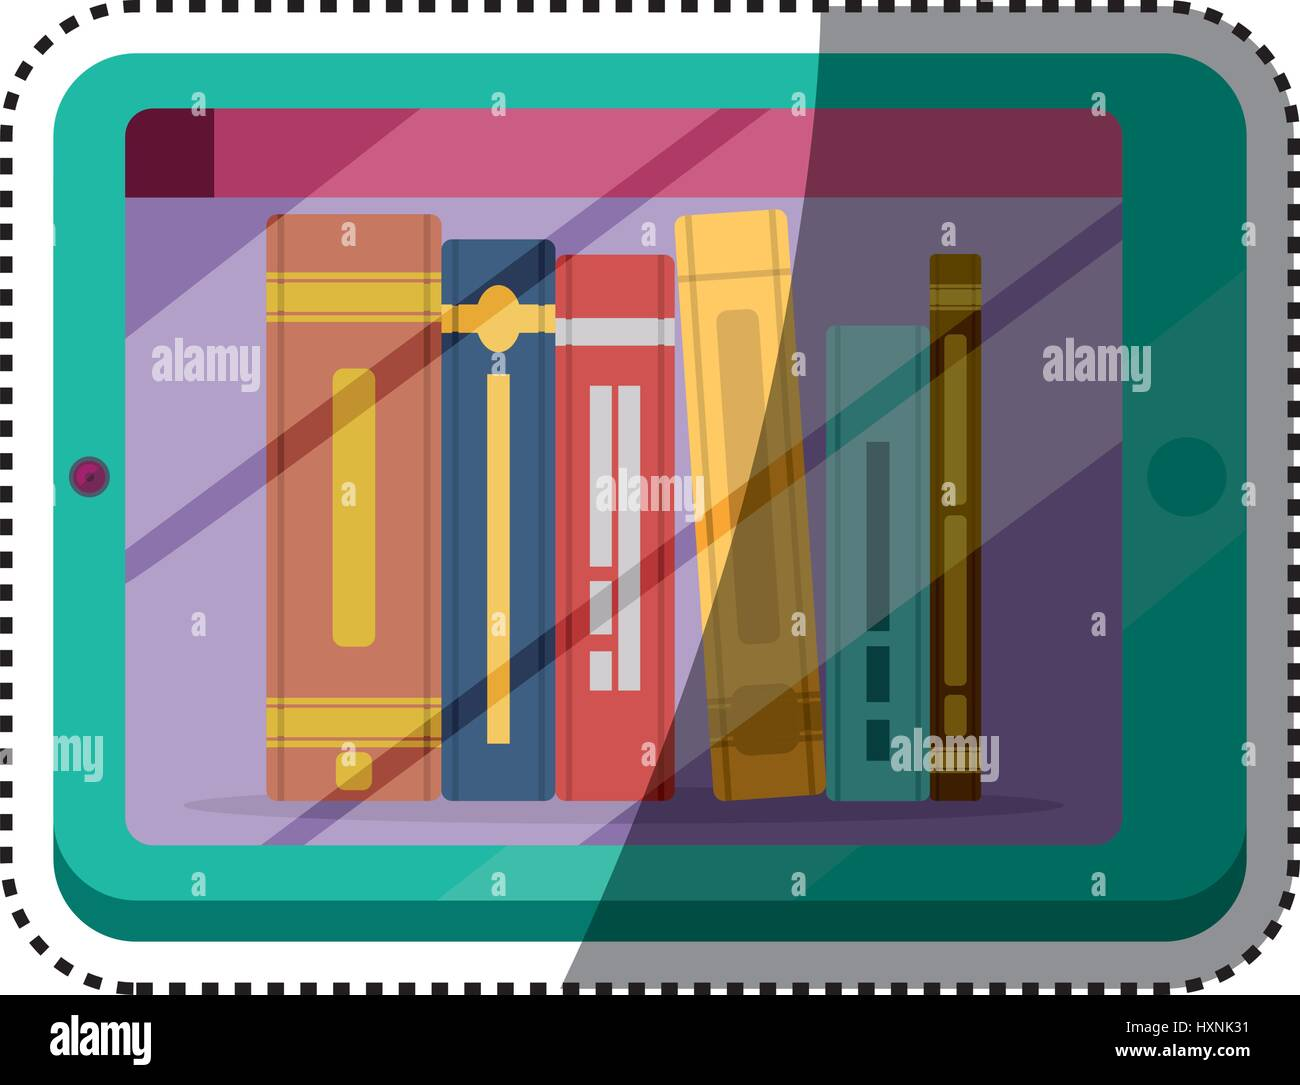 e-books, books purchase and download - Stock Image